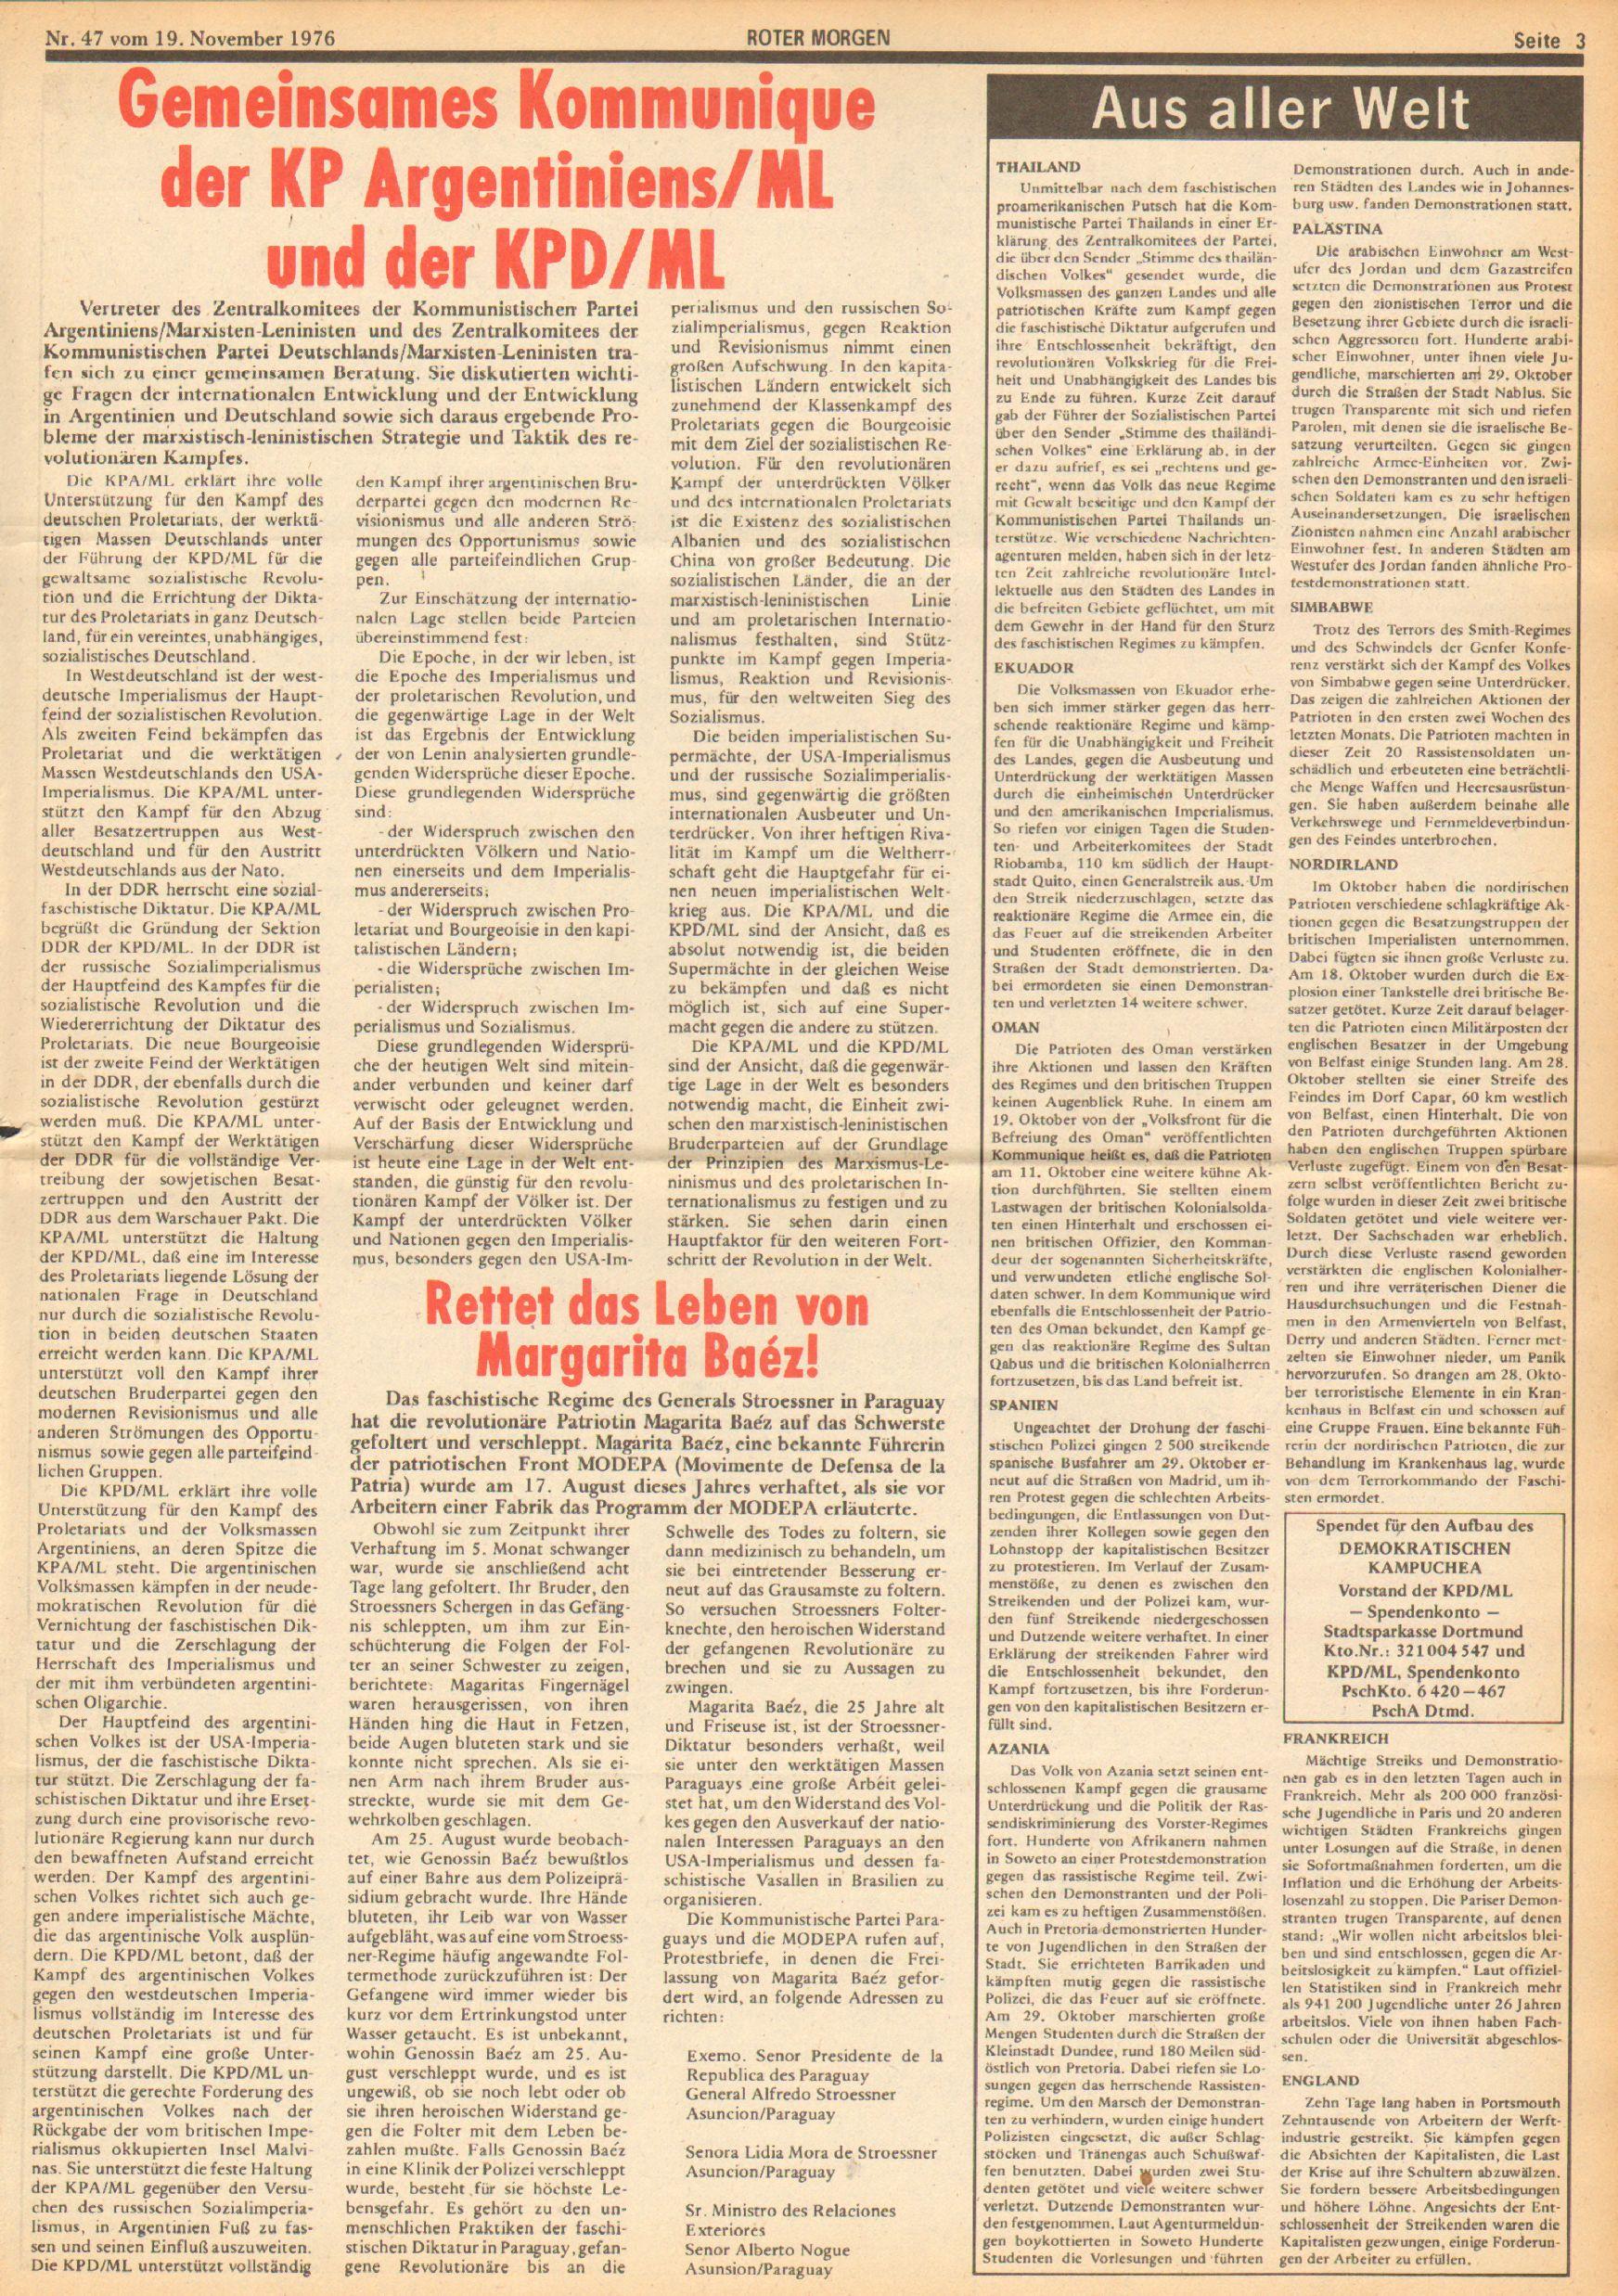 Roter Morgen, 10. Jg., 19. November 1976, Nr. 47, Seite 3